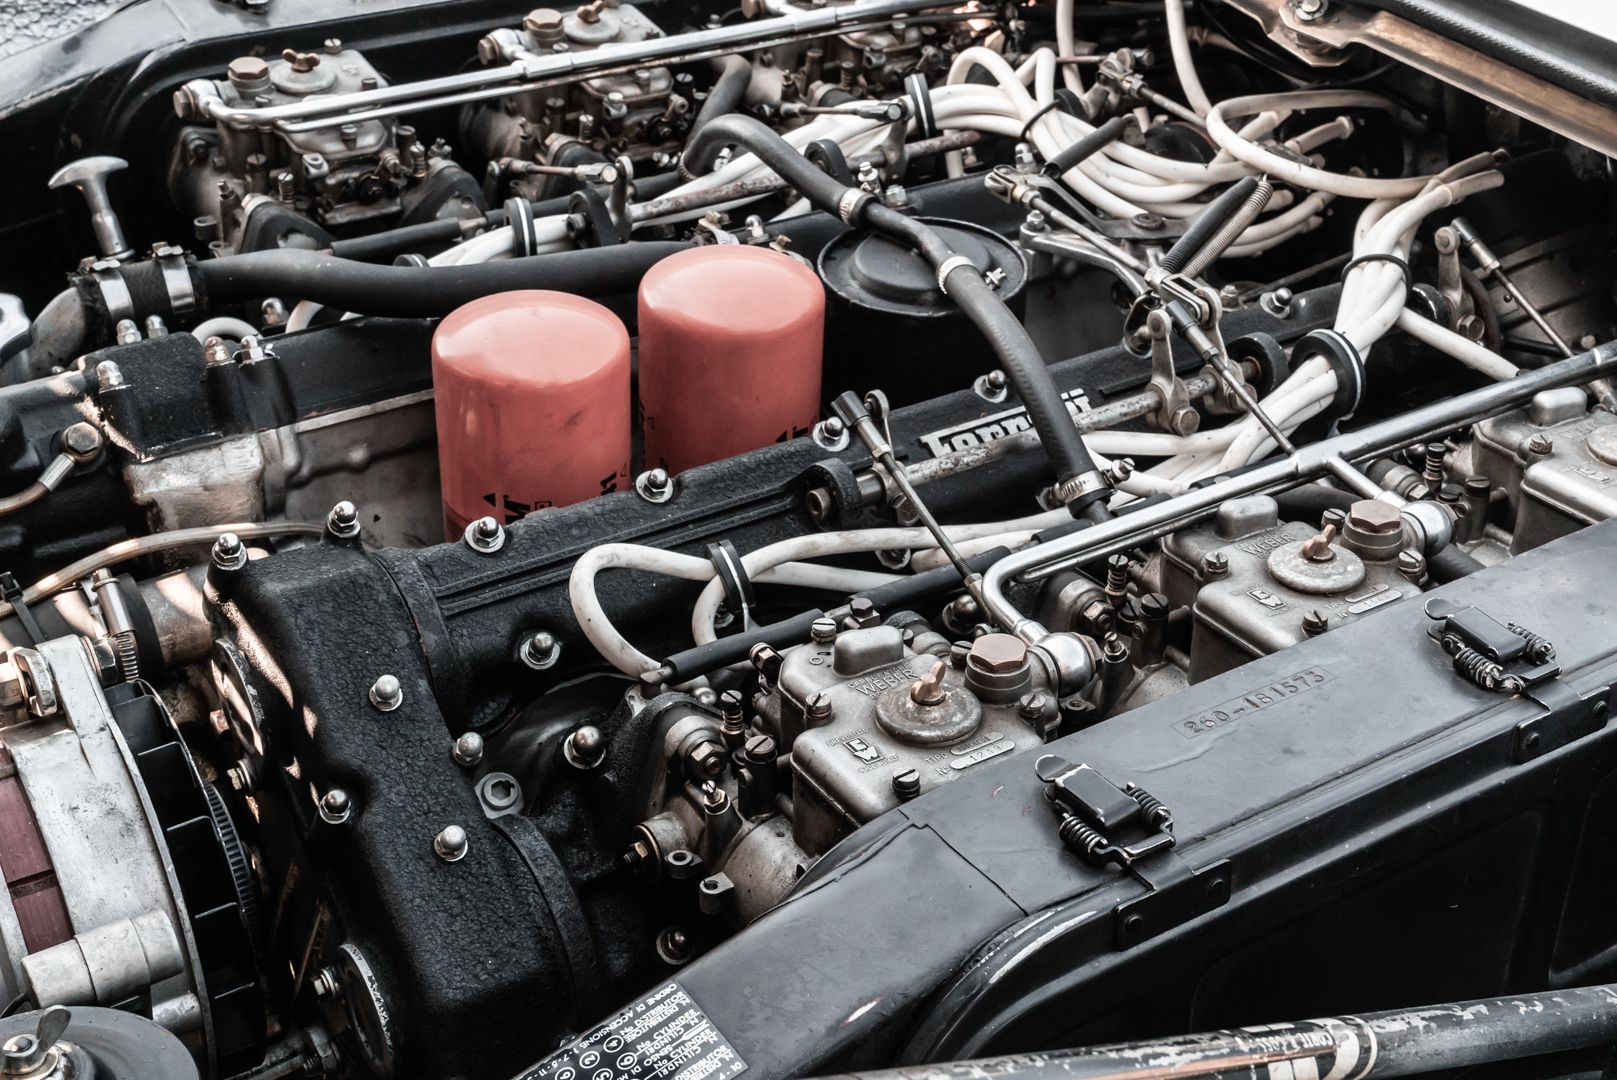 1973 Ferrari 365 GT4 2+2 66423